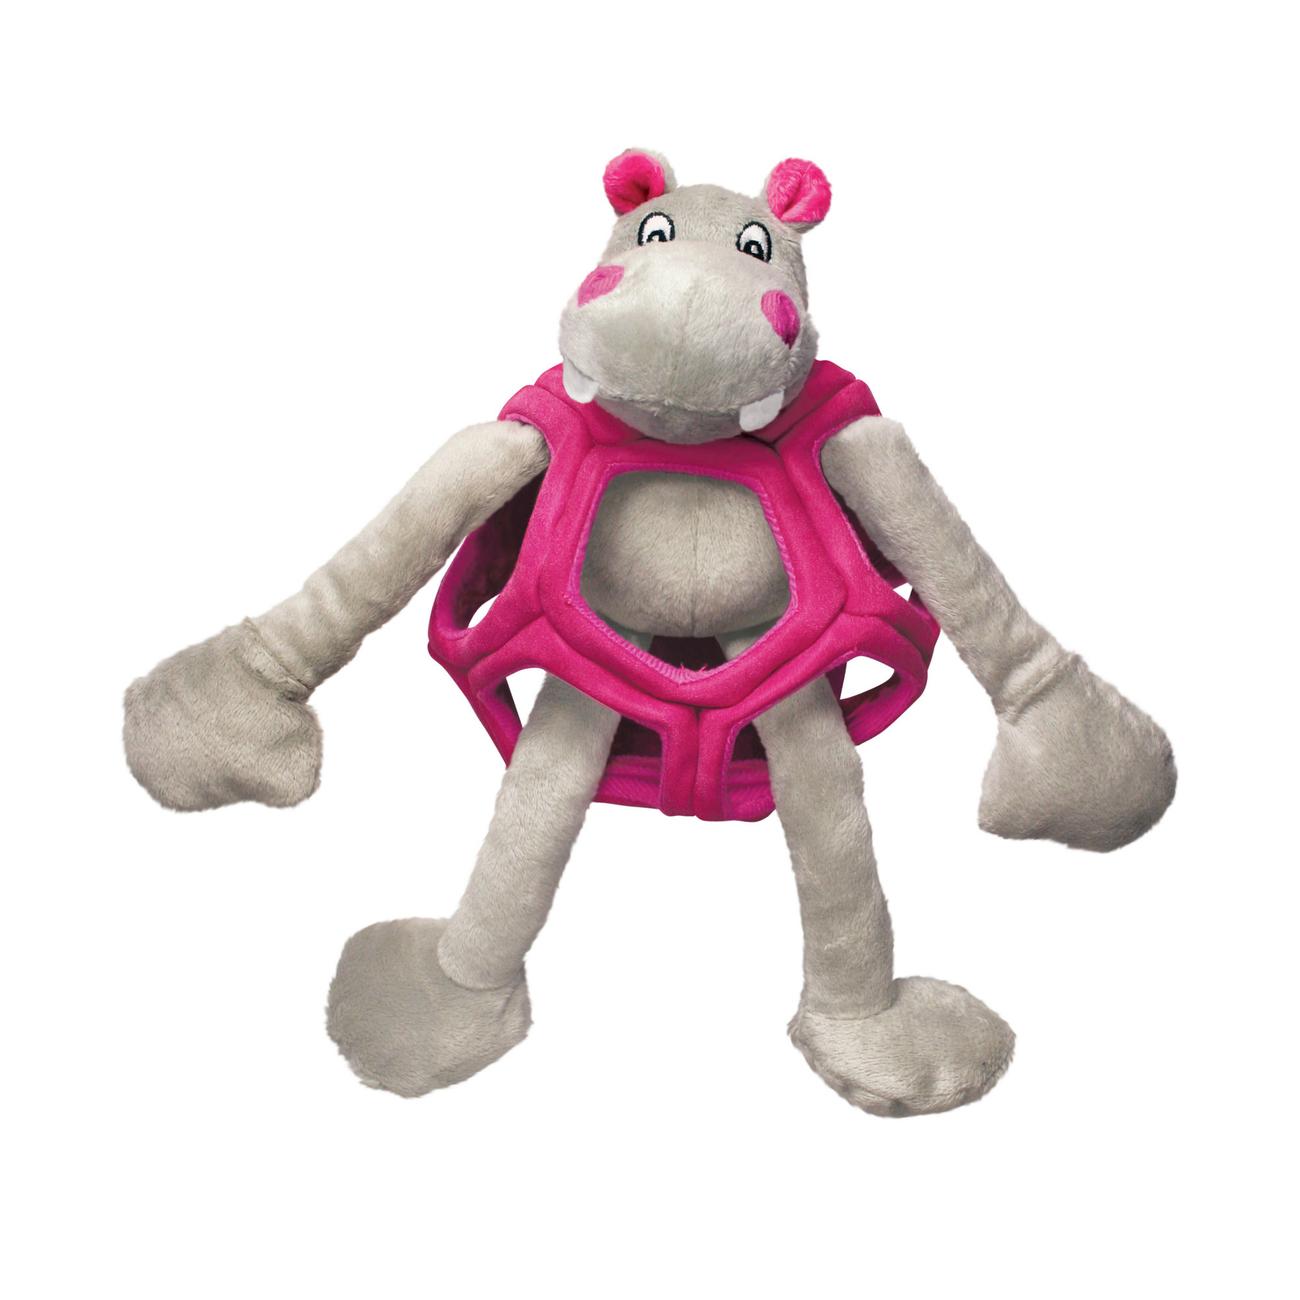 KONG Puzzlements Hundespielzeug, Bild 8